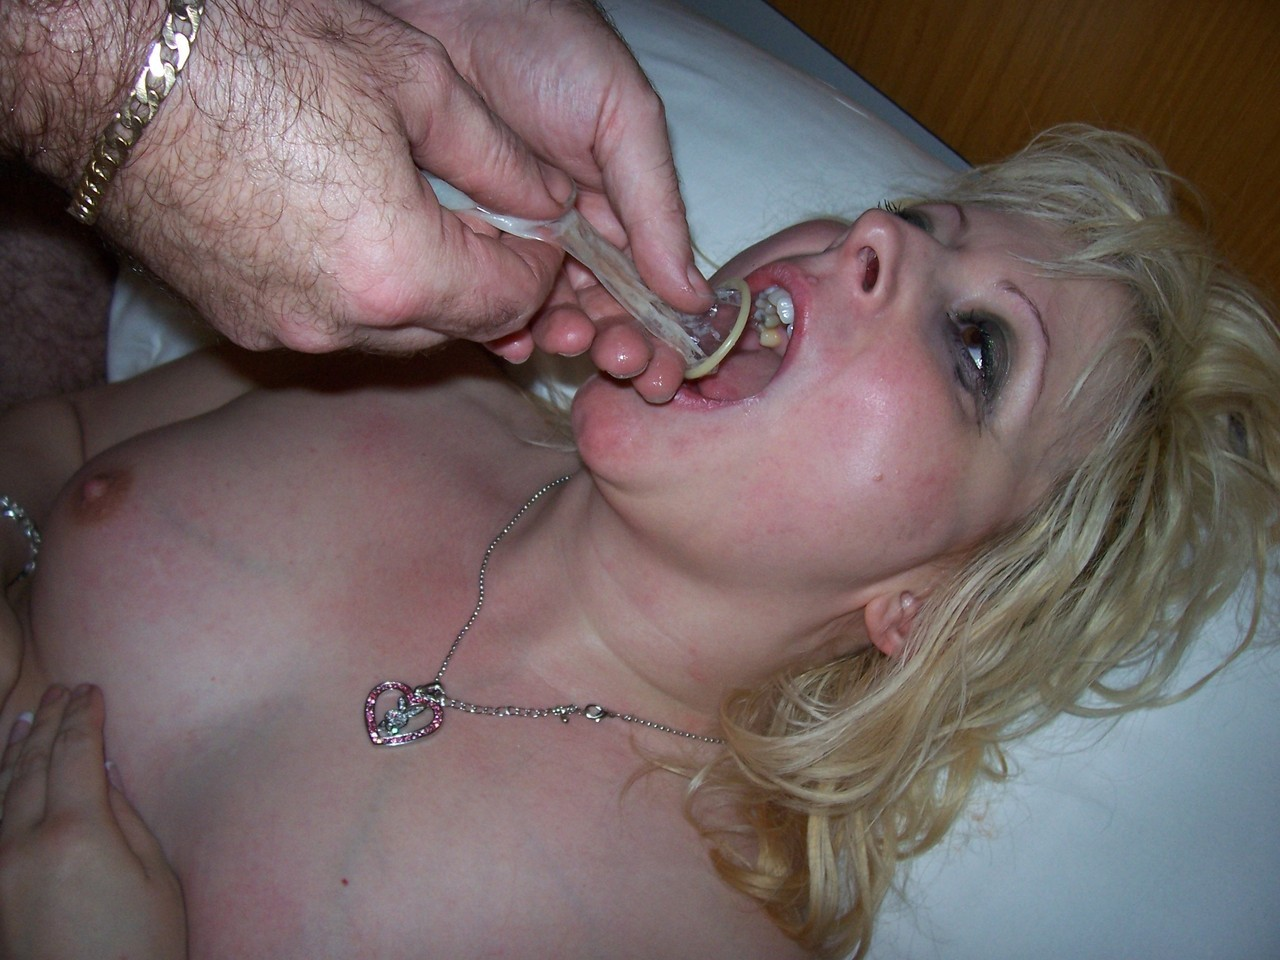 Cuckold condom humiliation collection brat perversions 7